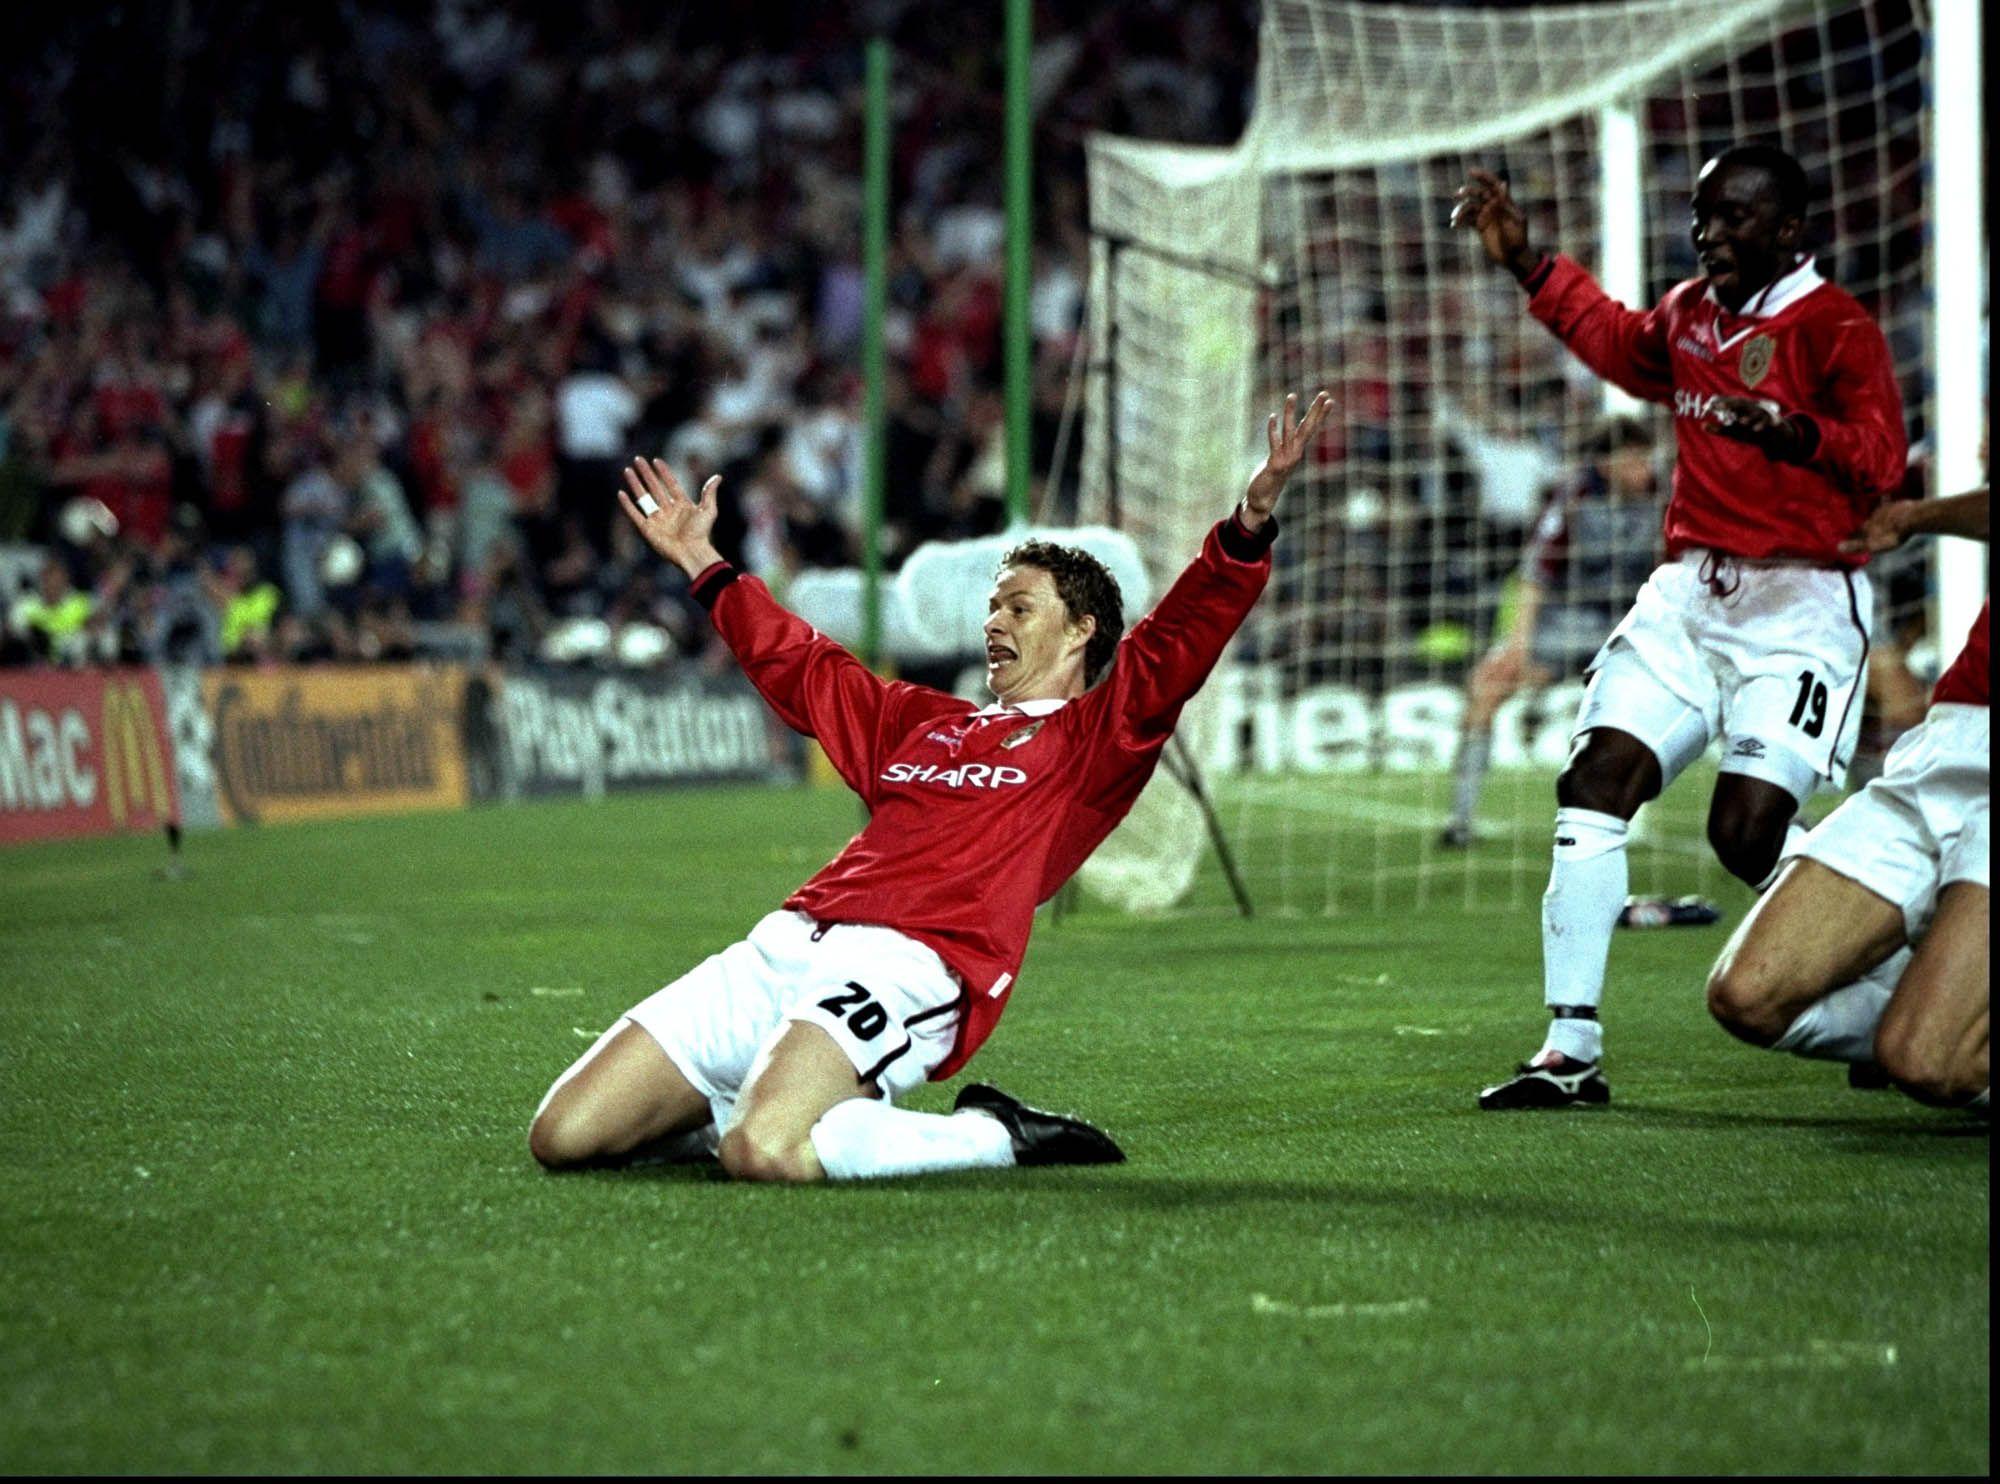 Solskjaer Vs Bayern Munich 1999 Ucl Final Manchester United Manchester United Team Manchester United Football Club